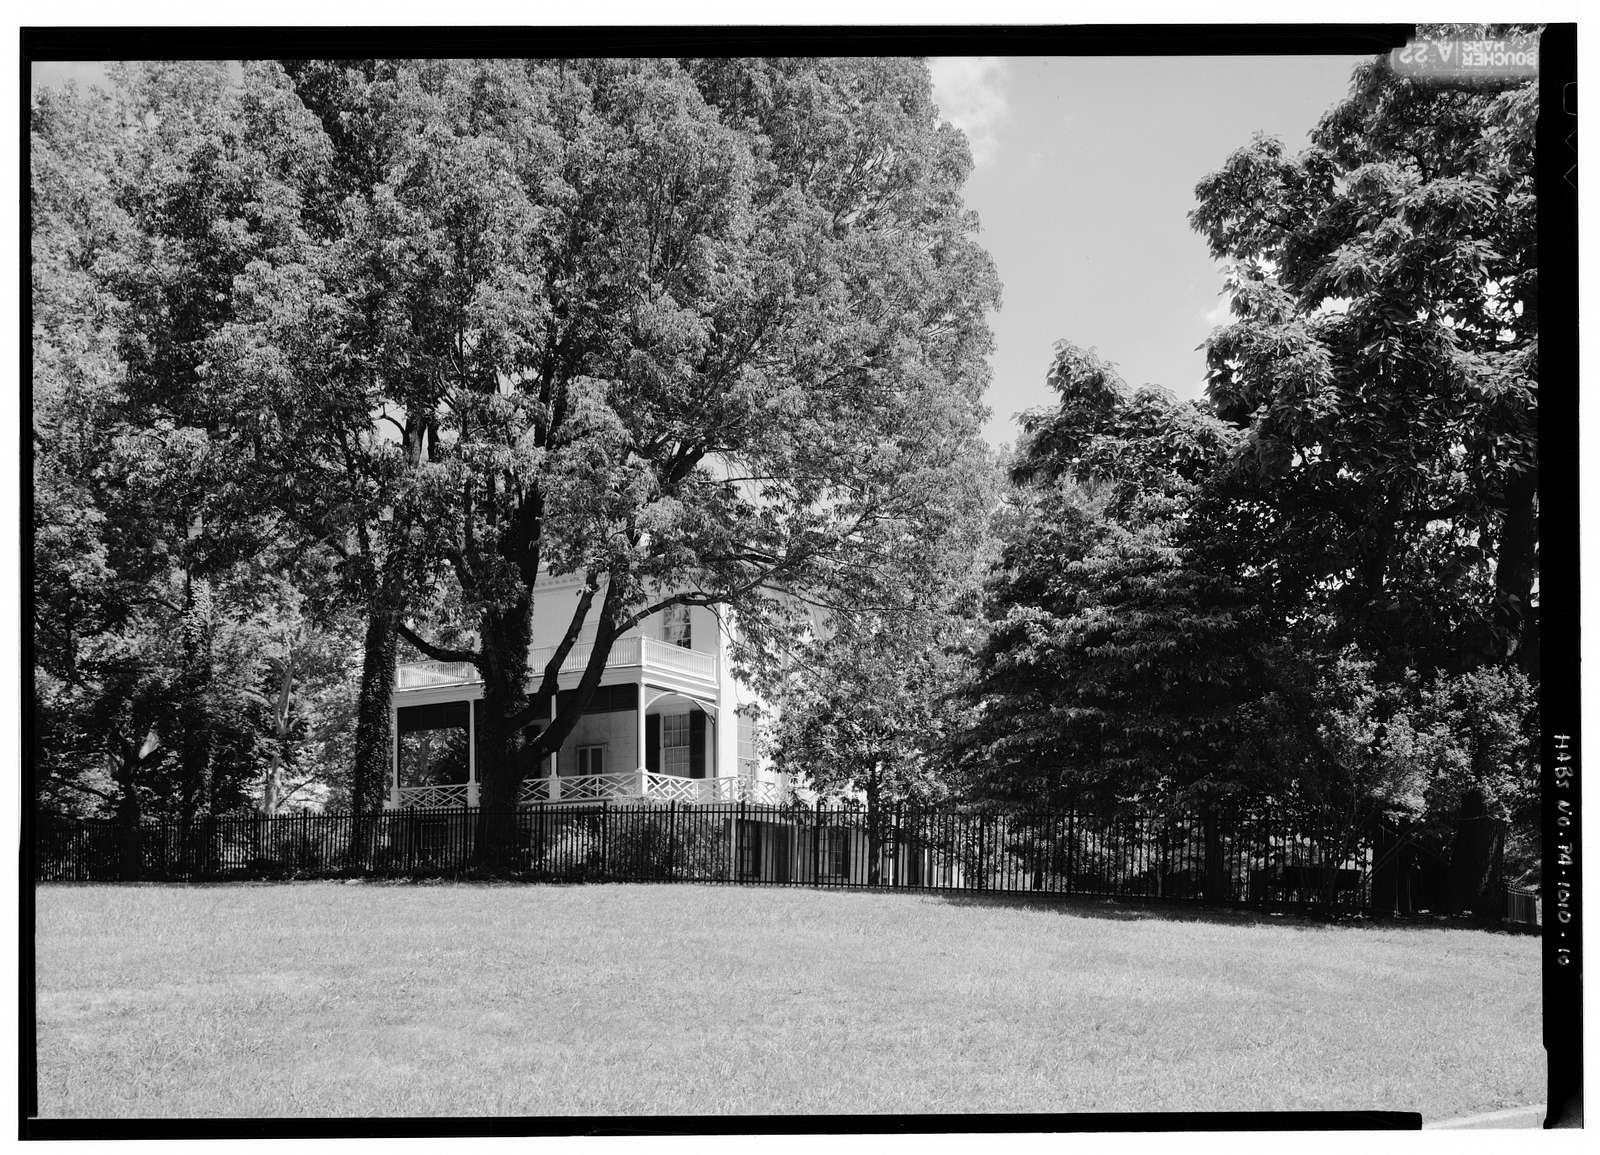 Lemon Hill, Lemon Hill Drive, Philadelphia, Philadelphia County, PA